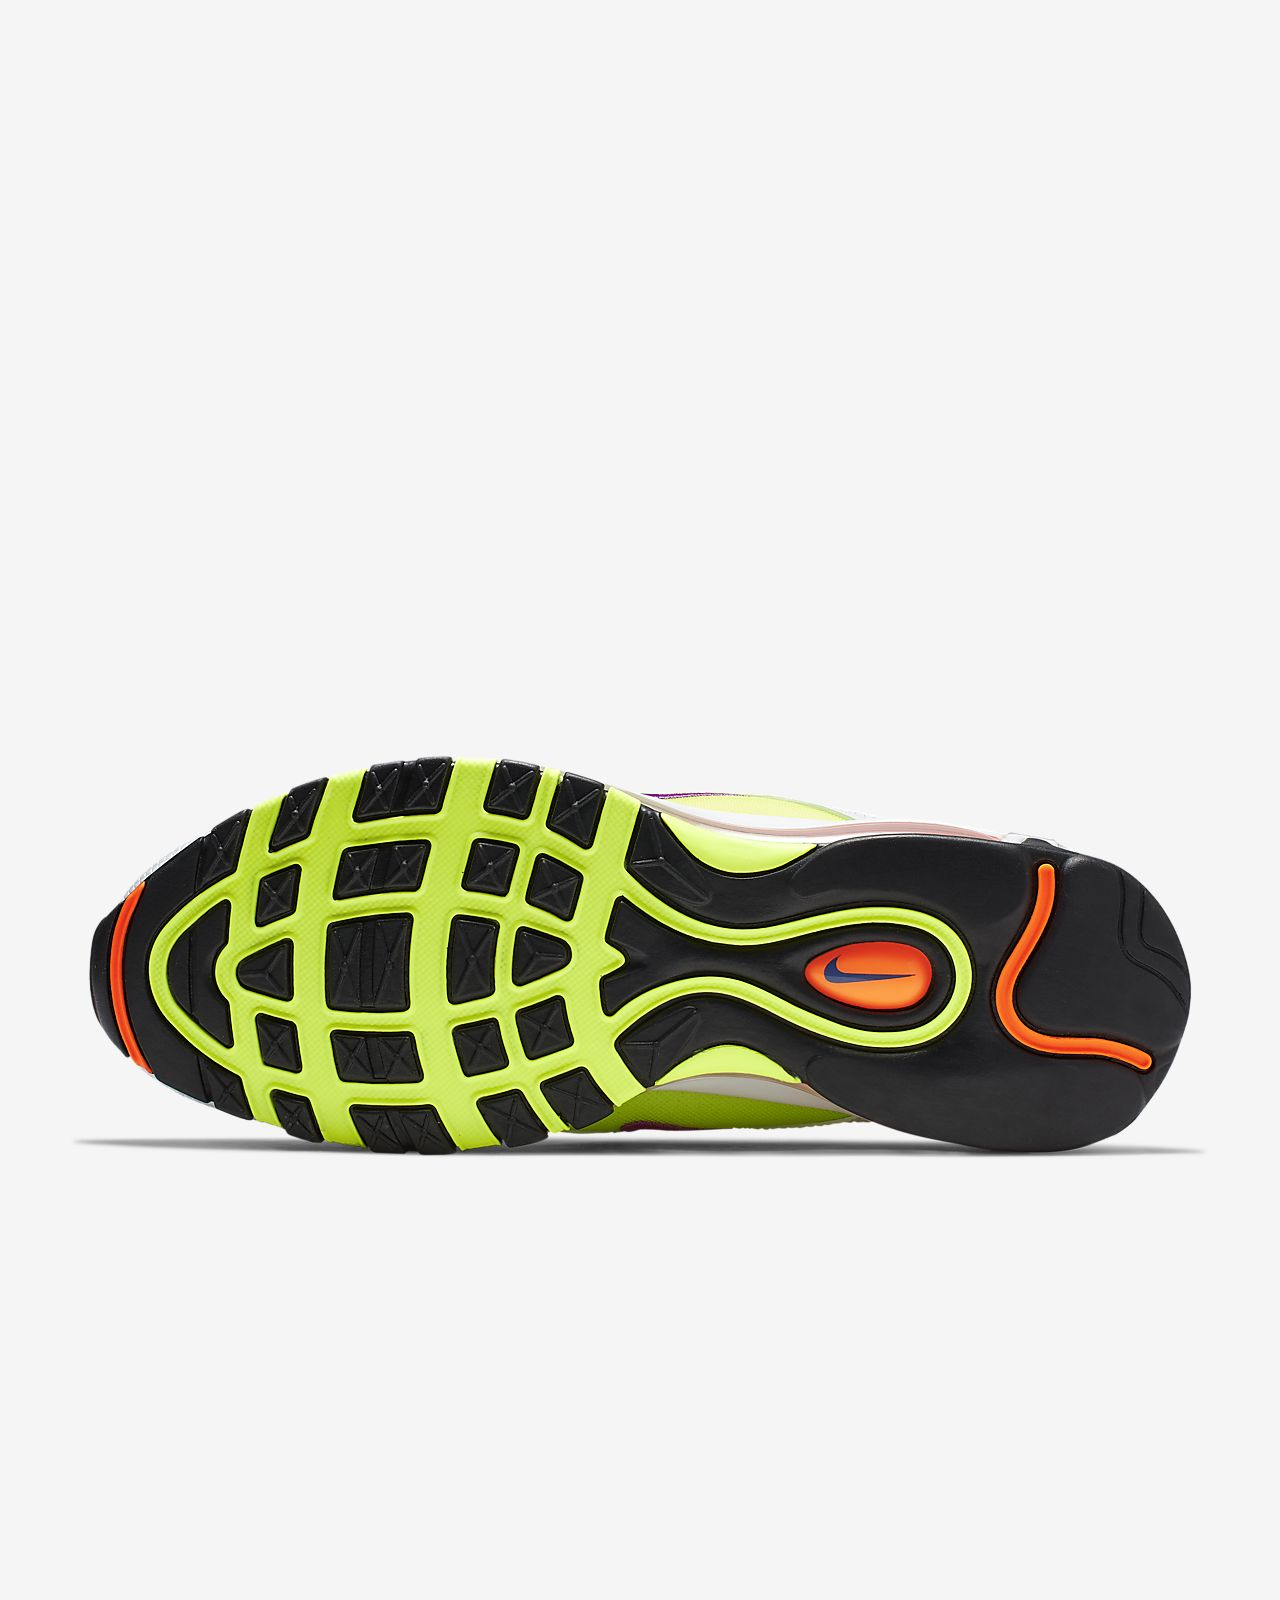 f7054d9b07 Nike Air Max 97 On Air Jasmine Lasode Shoe. Nike.com